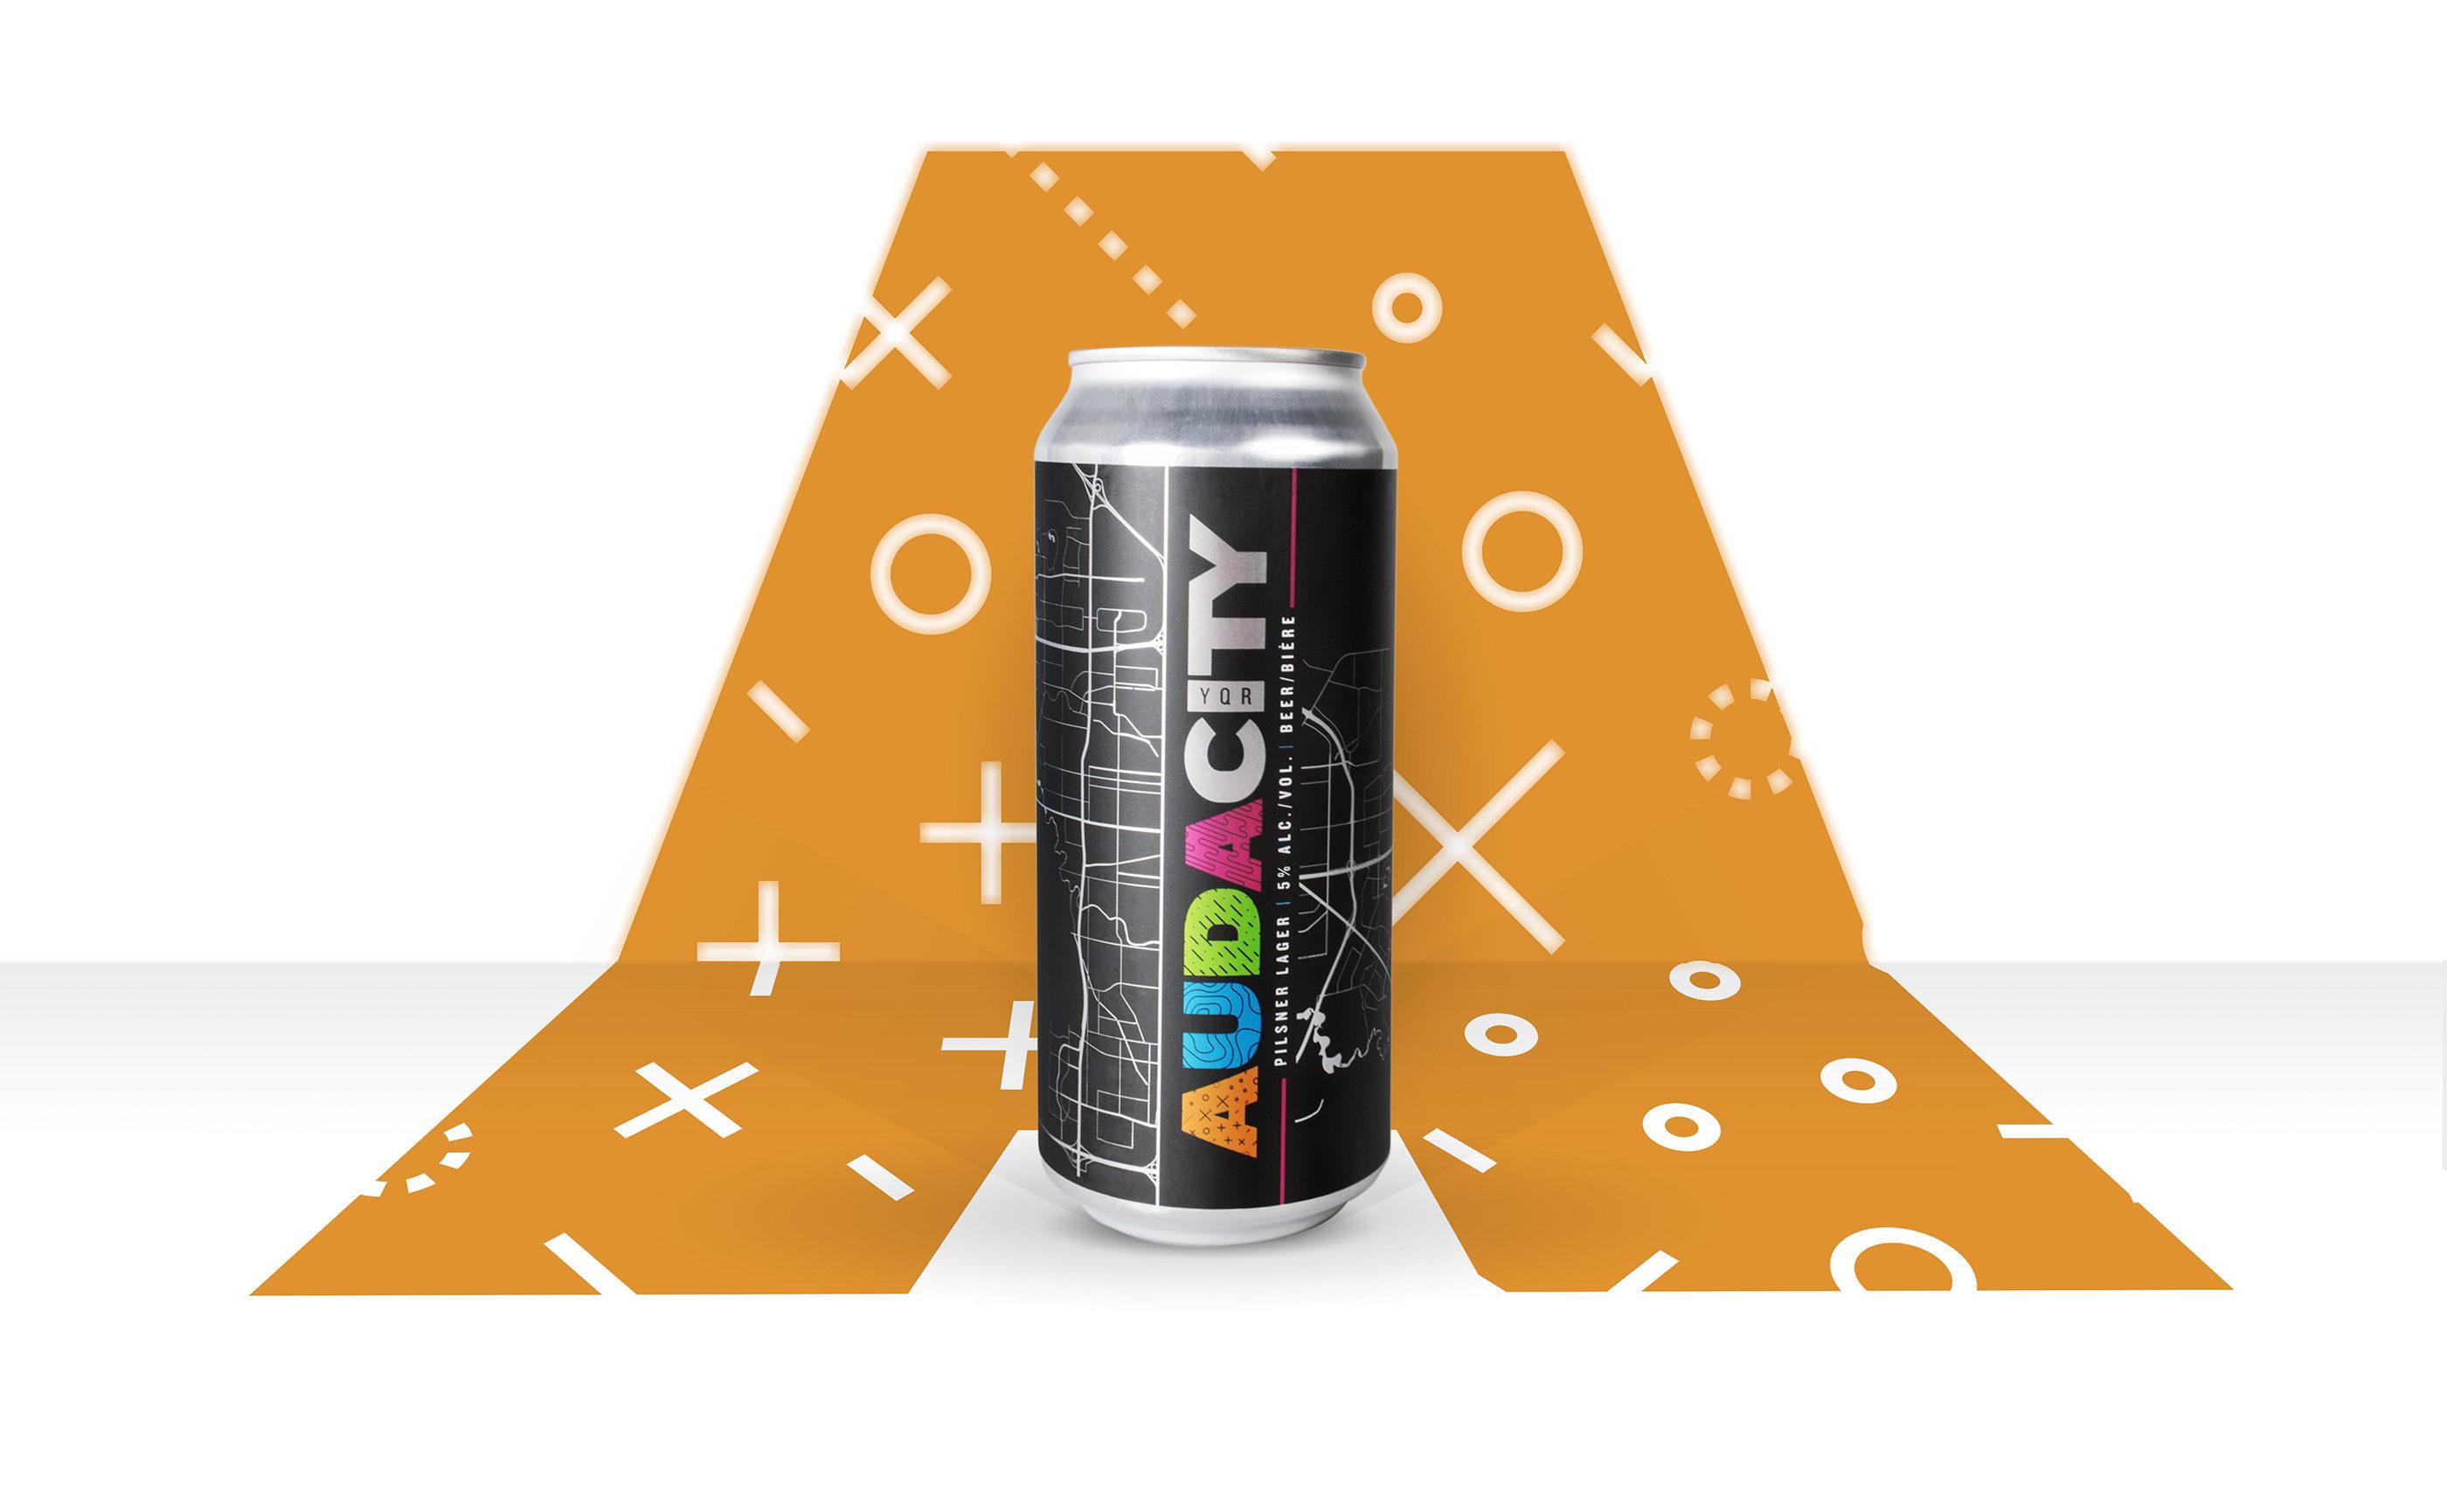 Audacity - Can